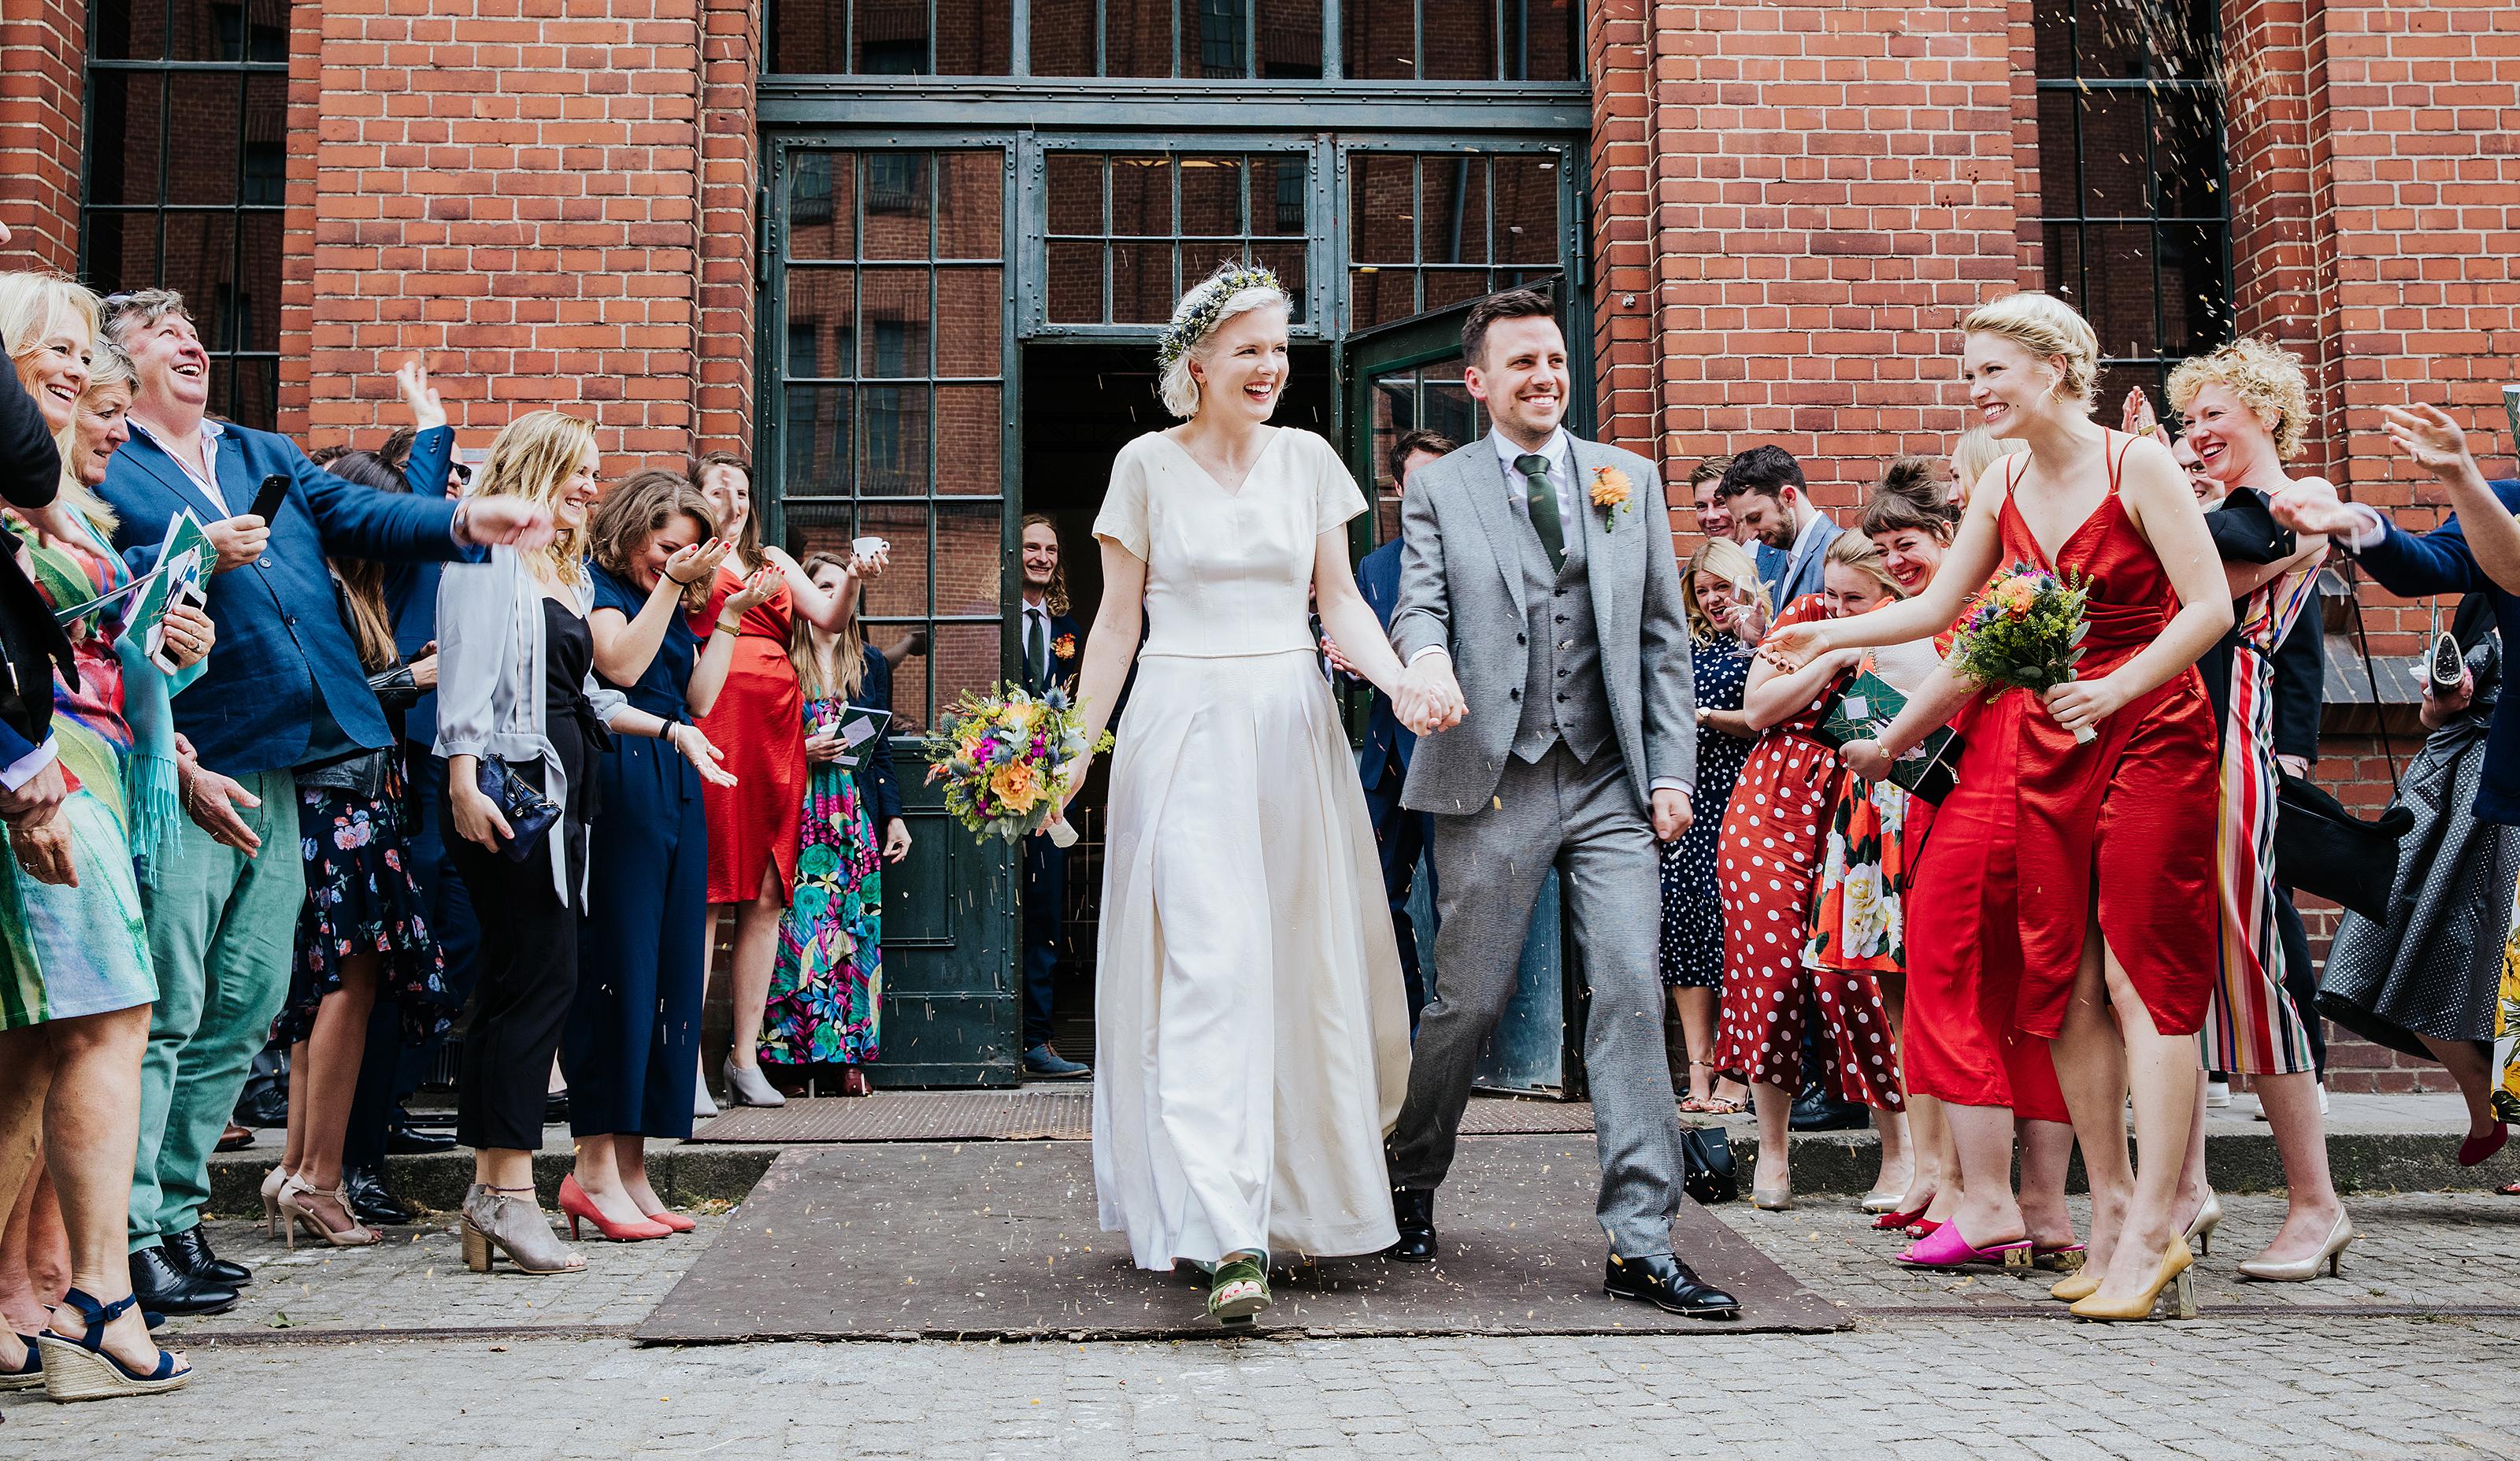 Hochzeitsreportage Melinda & Sam, Malzfabrik 2018